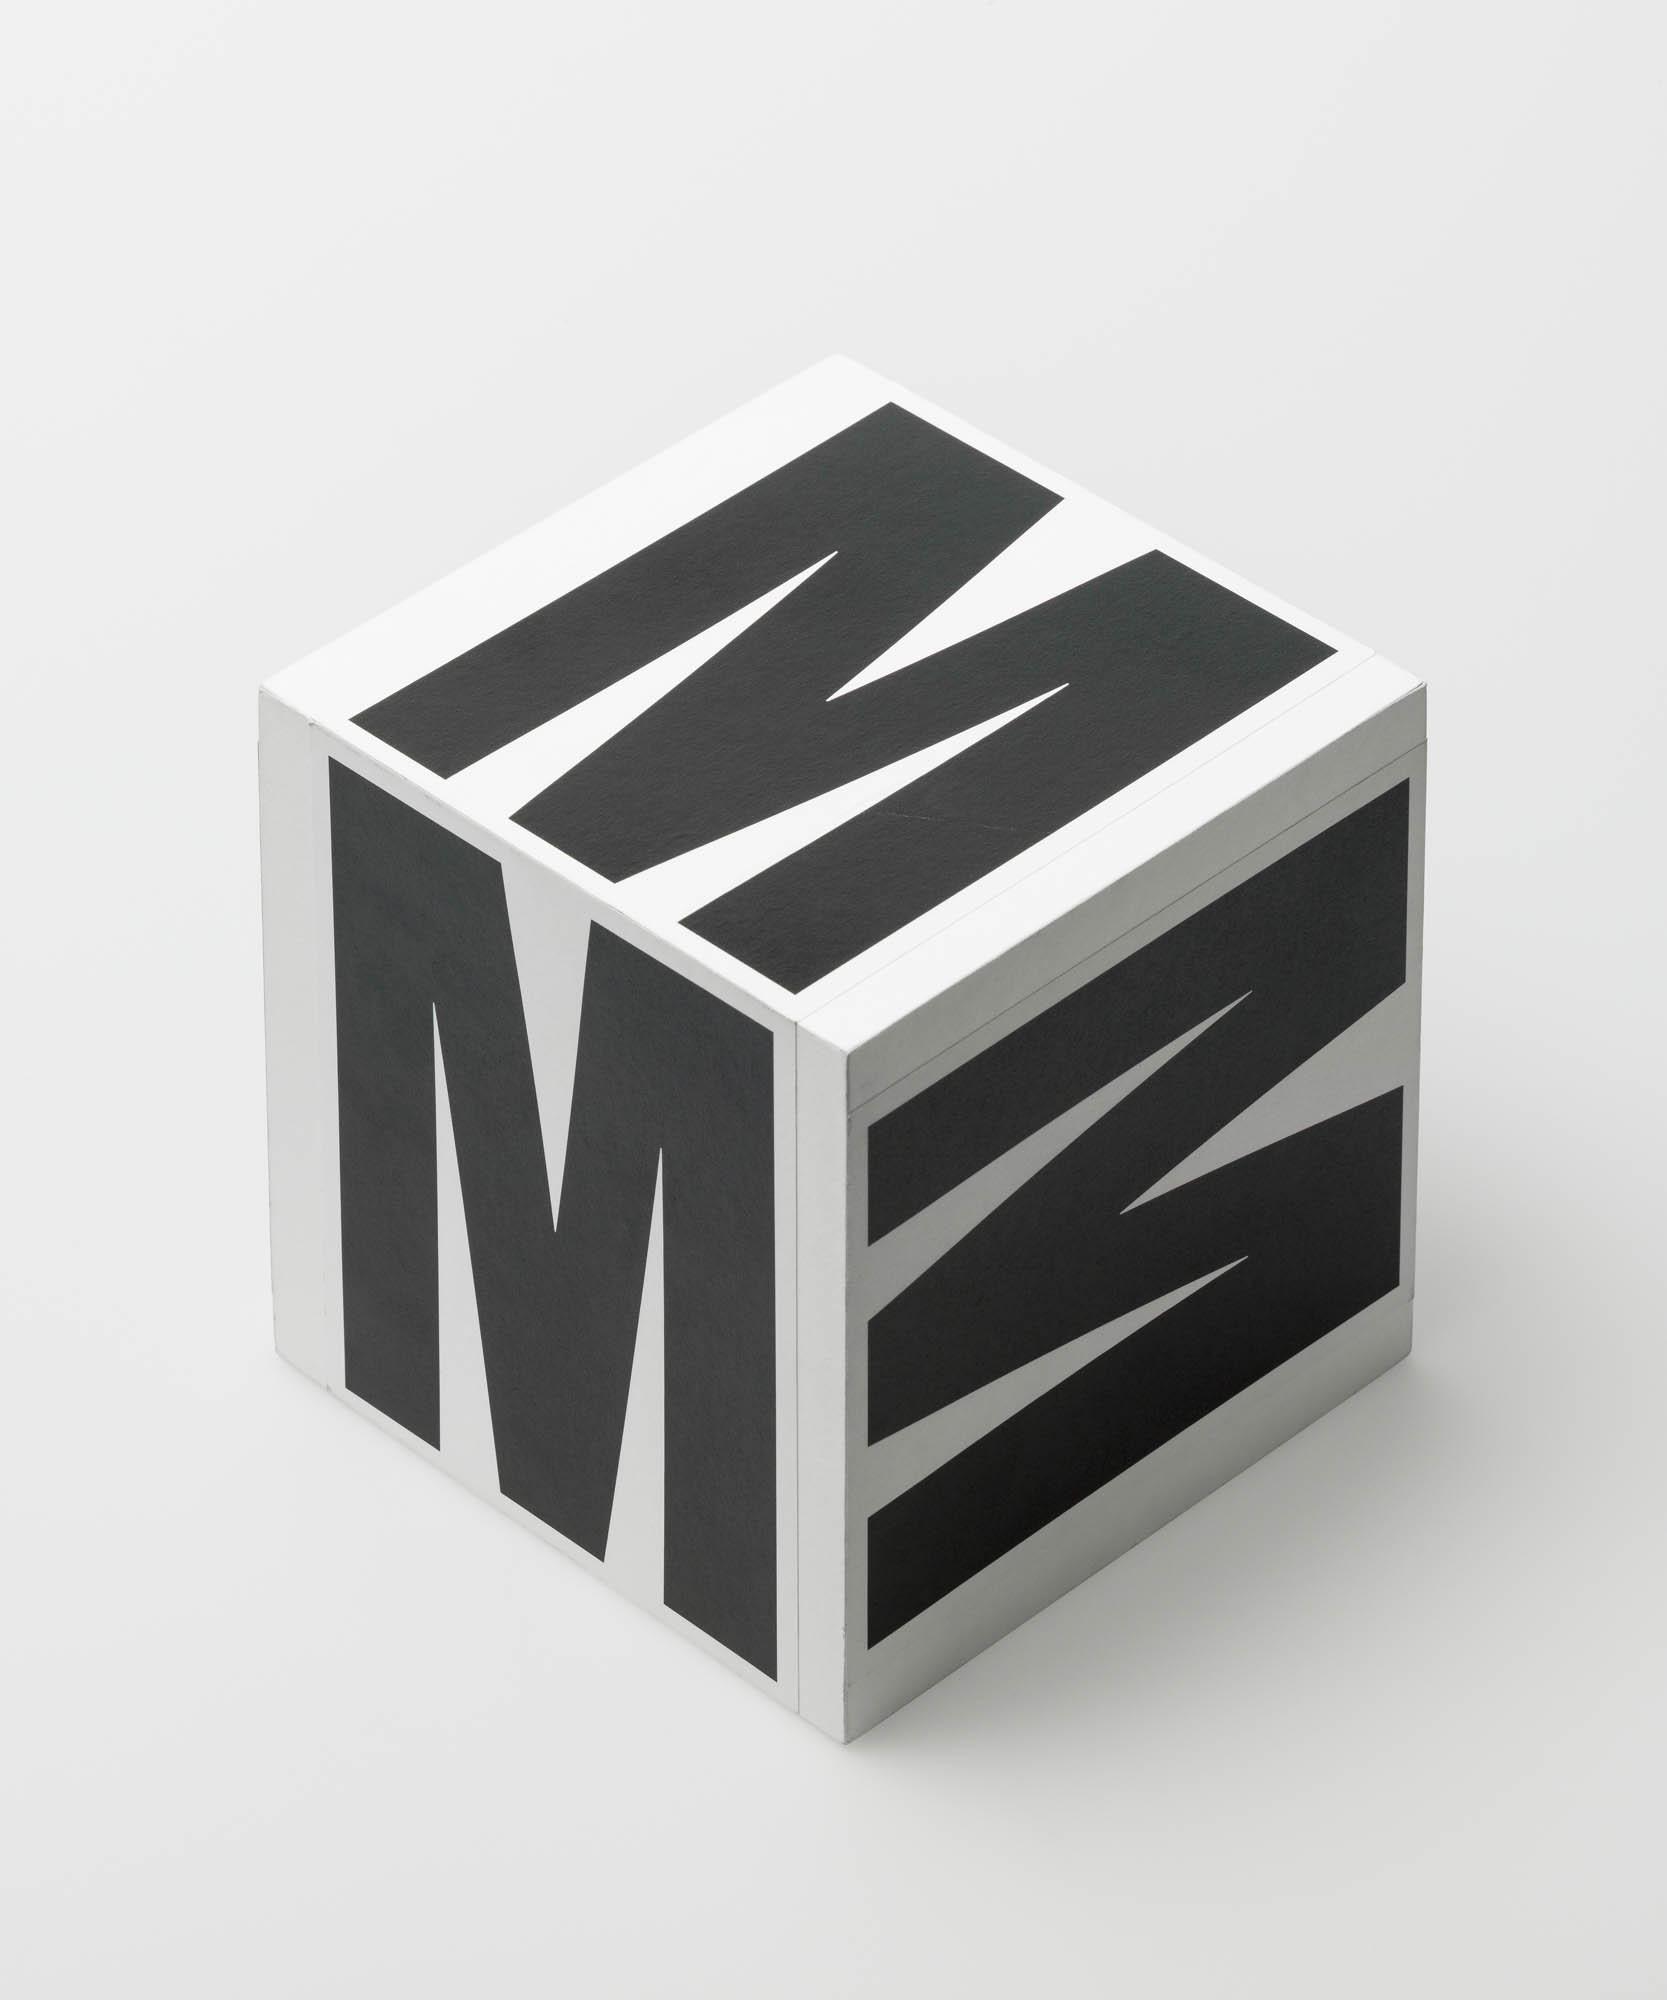 Foto optisches Experiment mit dem Buchstaben M Wolfgang Weingart Study assignment